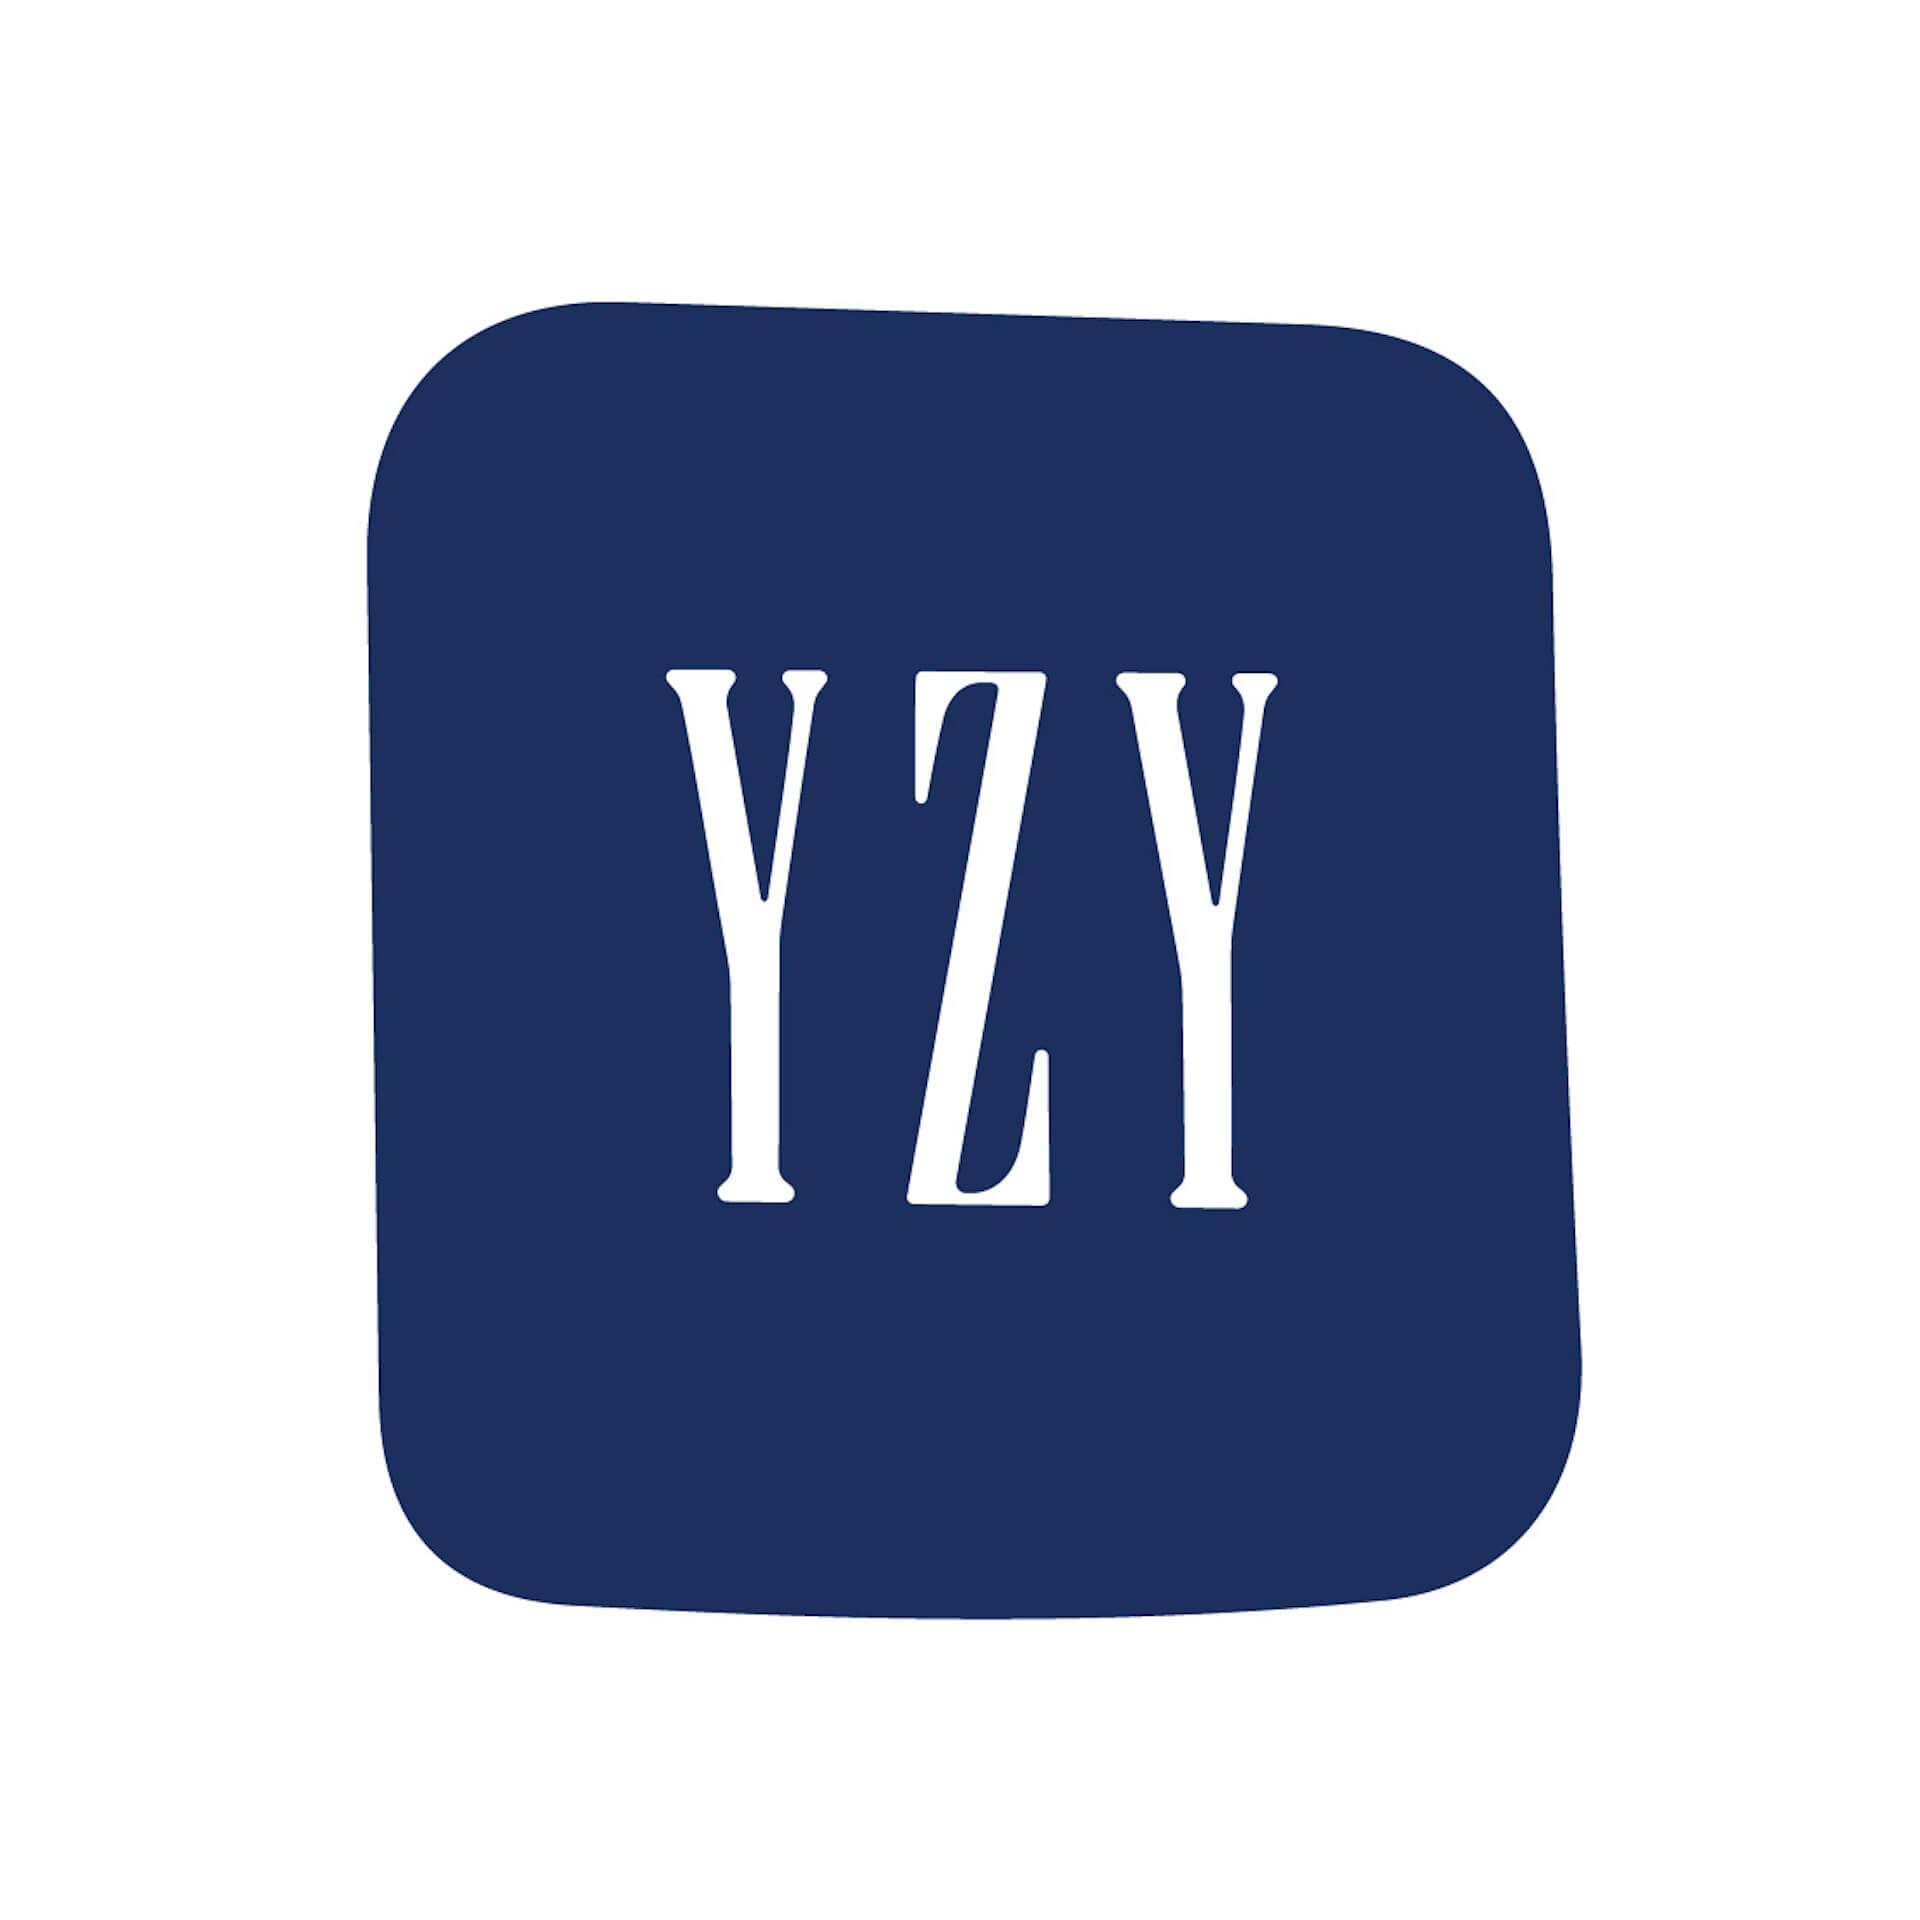 GapとKanye Westのコラボコレクション『YEEZY Gap』が2021年にリリース決定!メンズ、ウィメンズ、キッズ幅広く展開 lf200630_gap_kanyewest_01